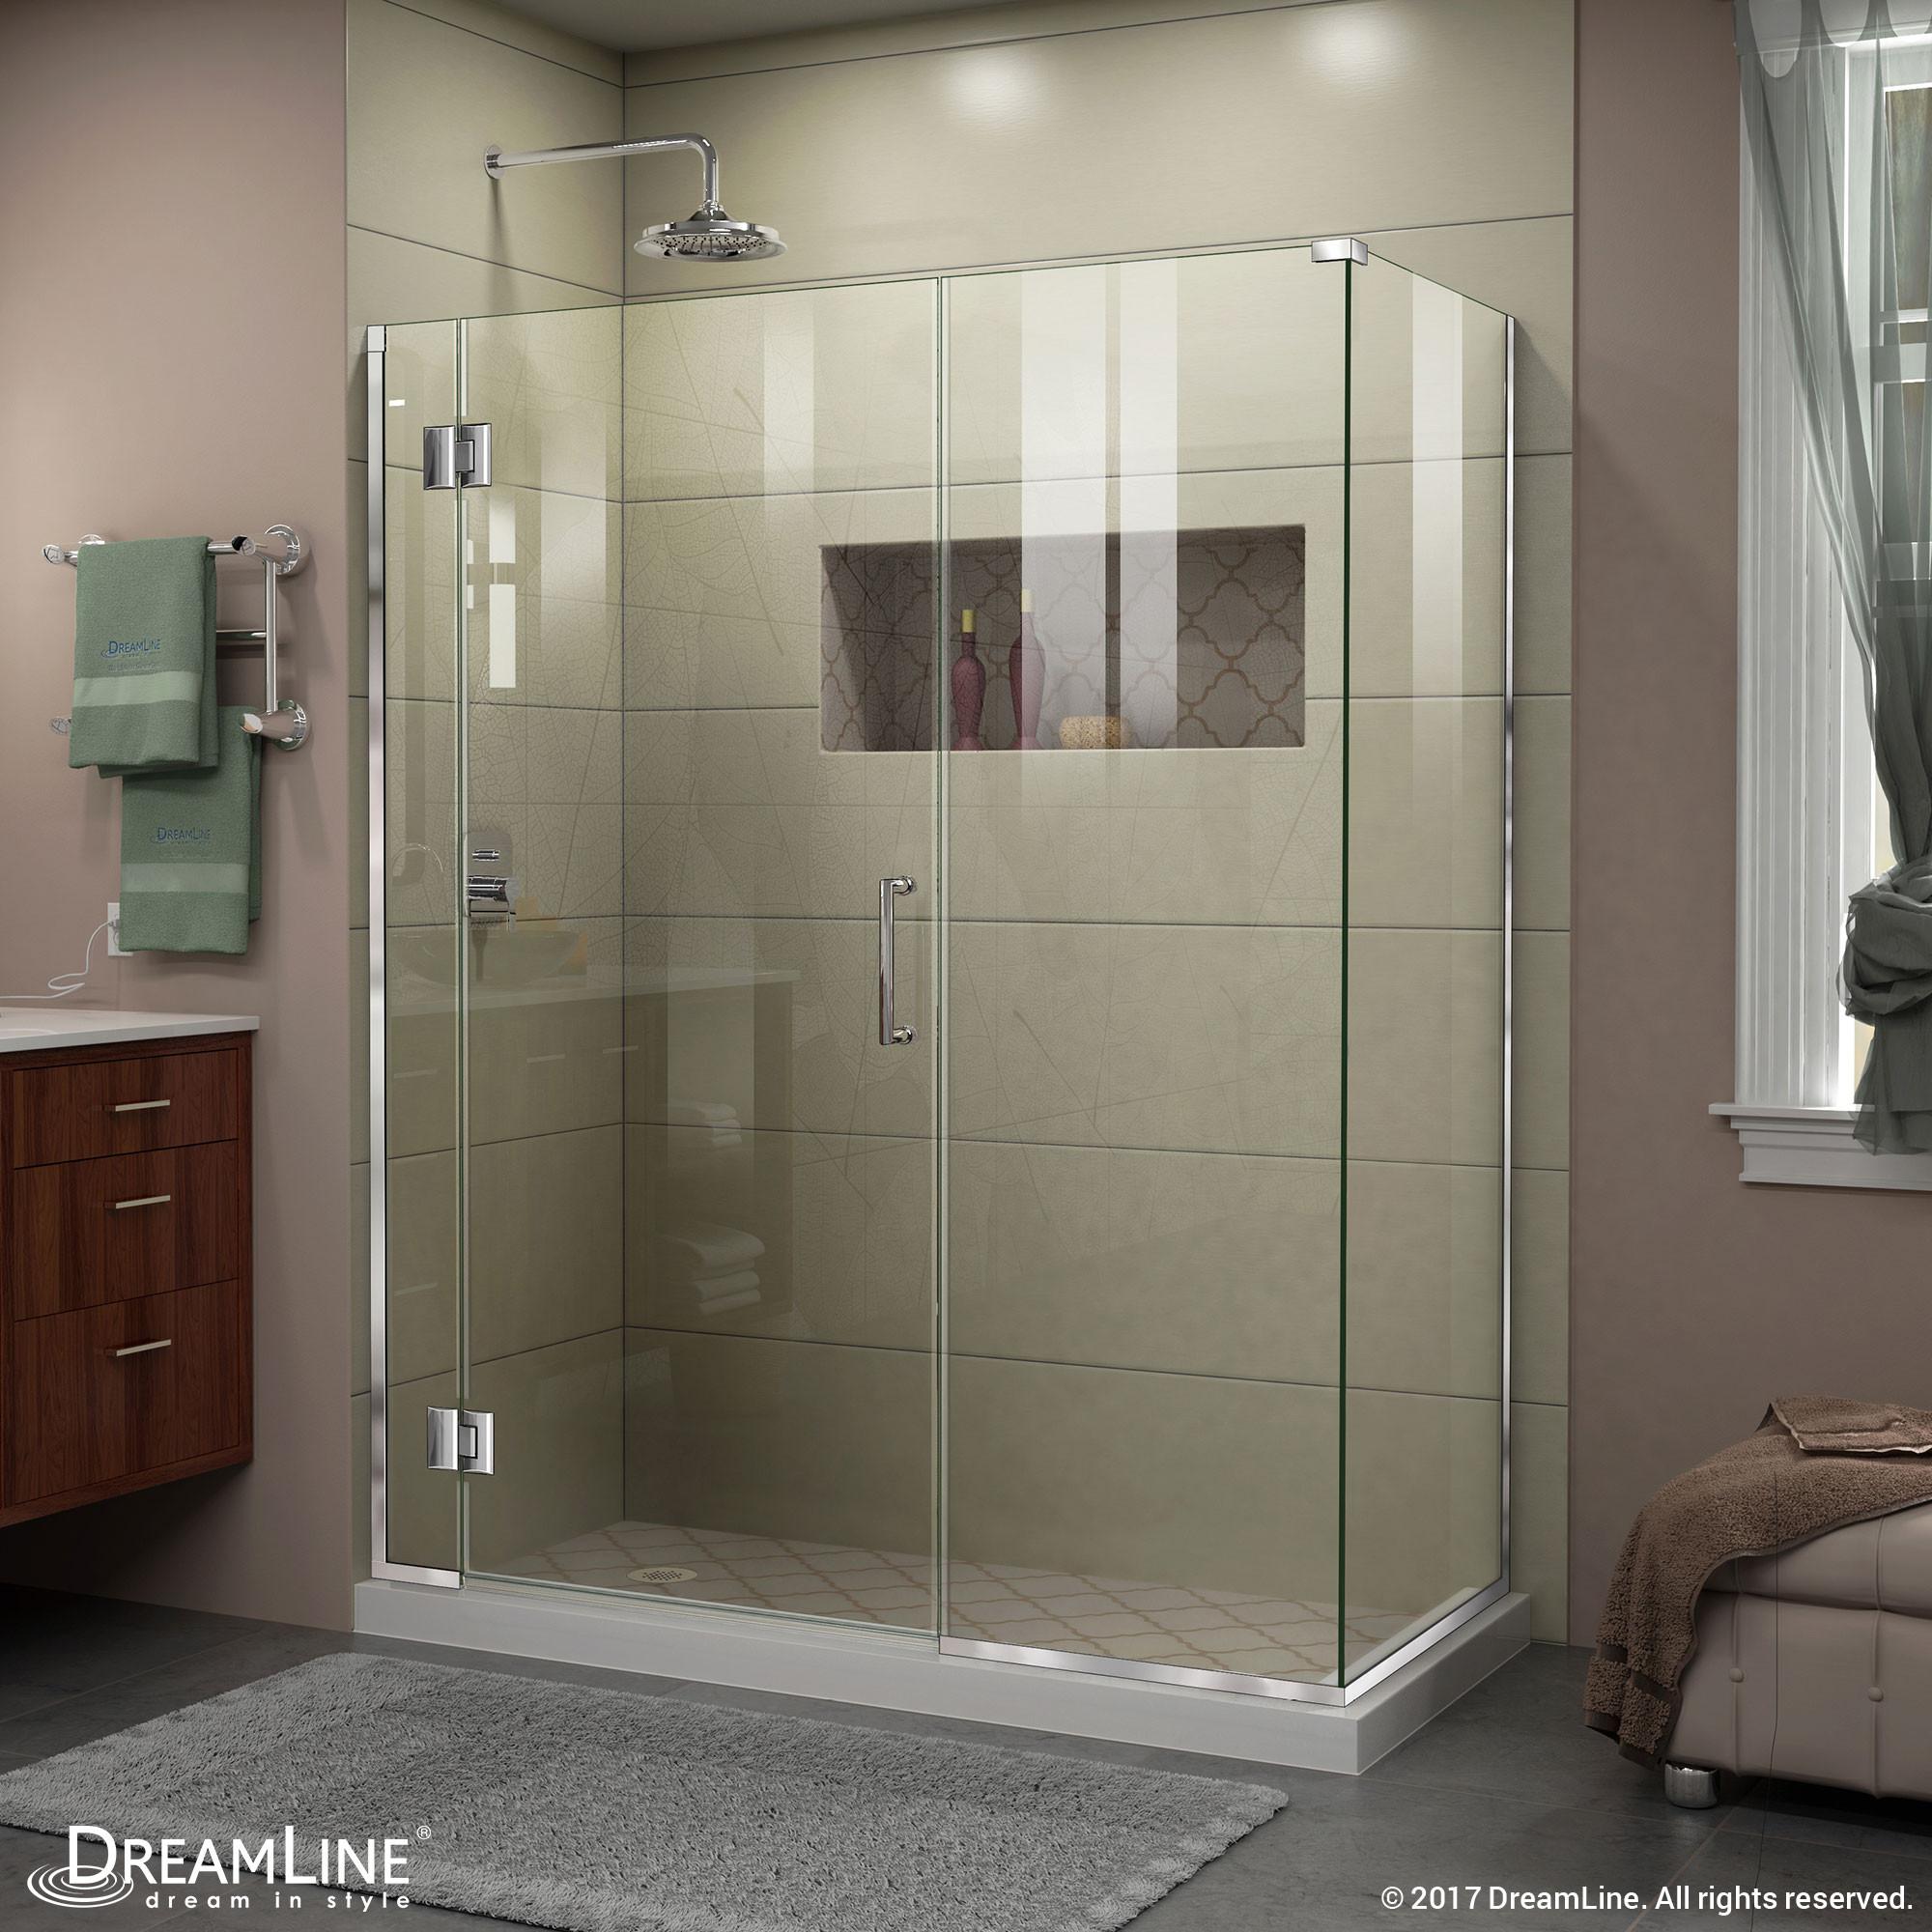 "DreamLine E1261434-01 Unidoor-X 46 x 34.375 x 72"" Hinged Shower Enclosure In Chrome Finish"